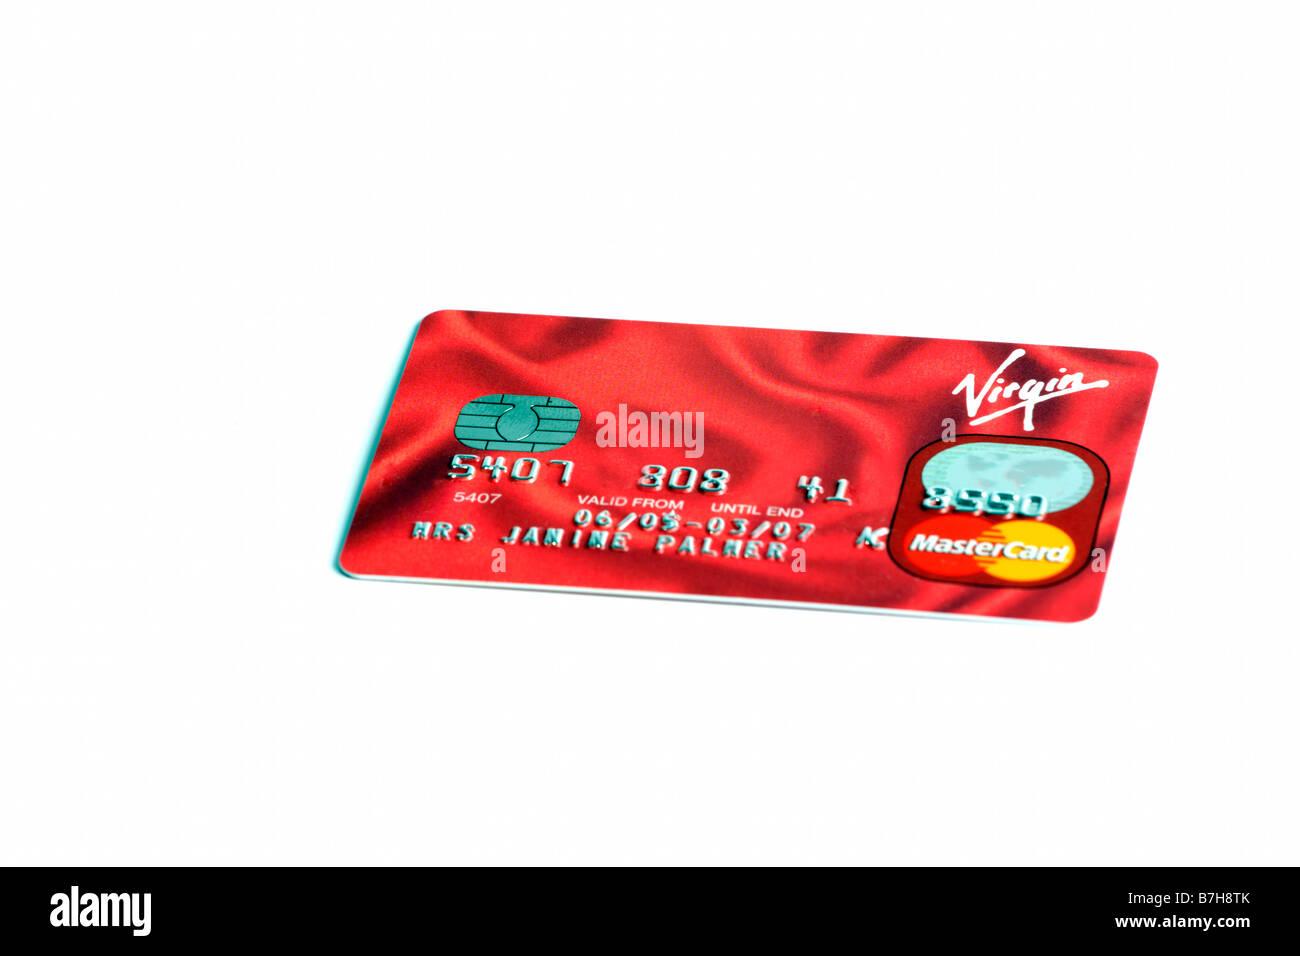 Virgin Credit card Stock Photo